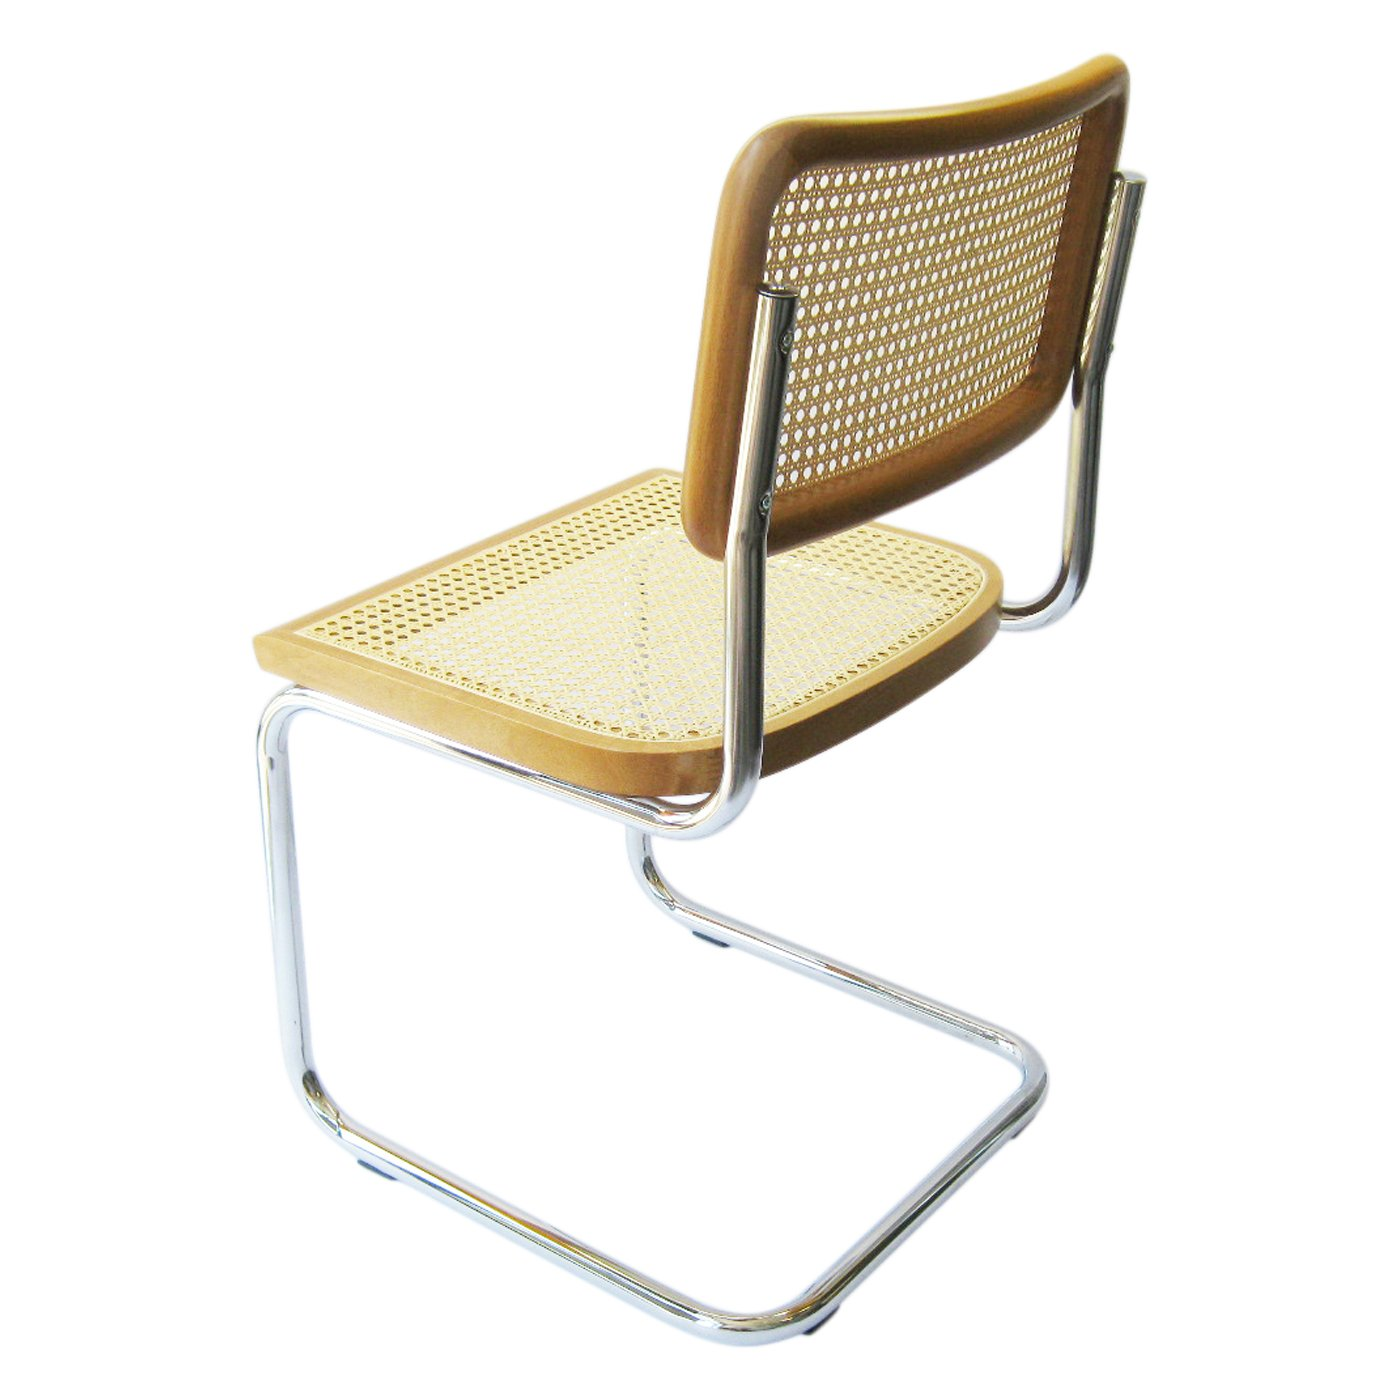 Breuer Chair Breuer Chair Seat Back Marcel Breuer B 33